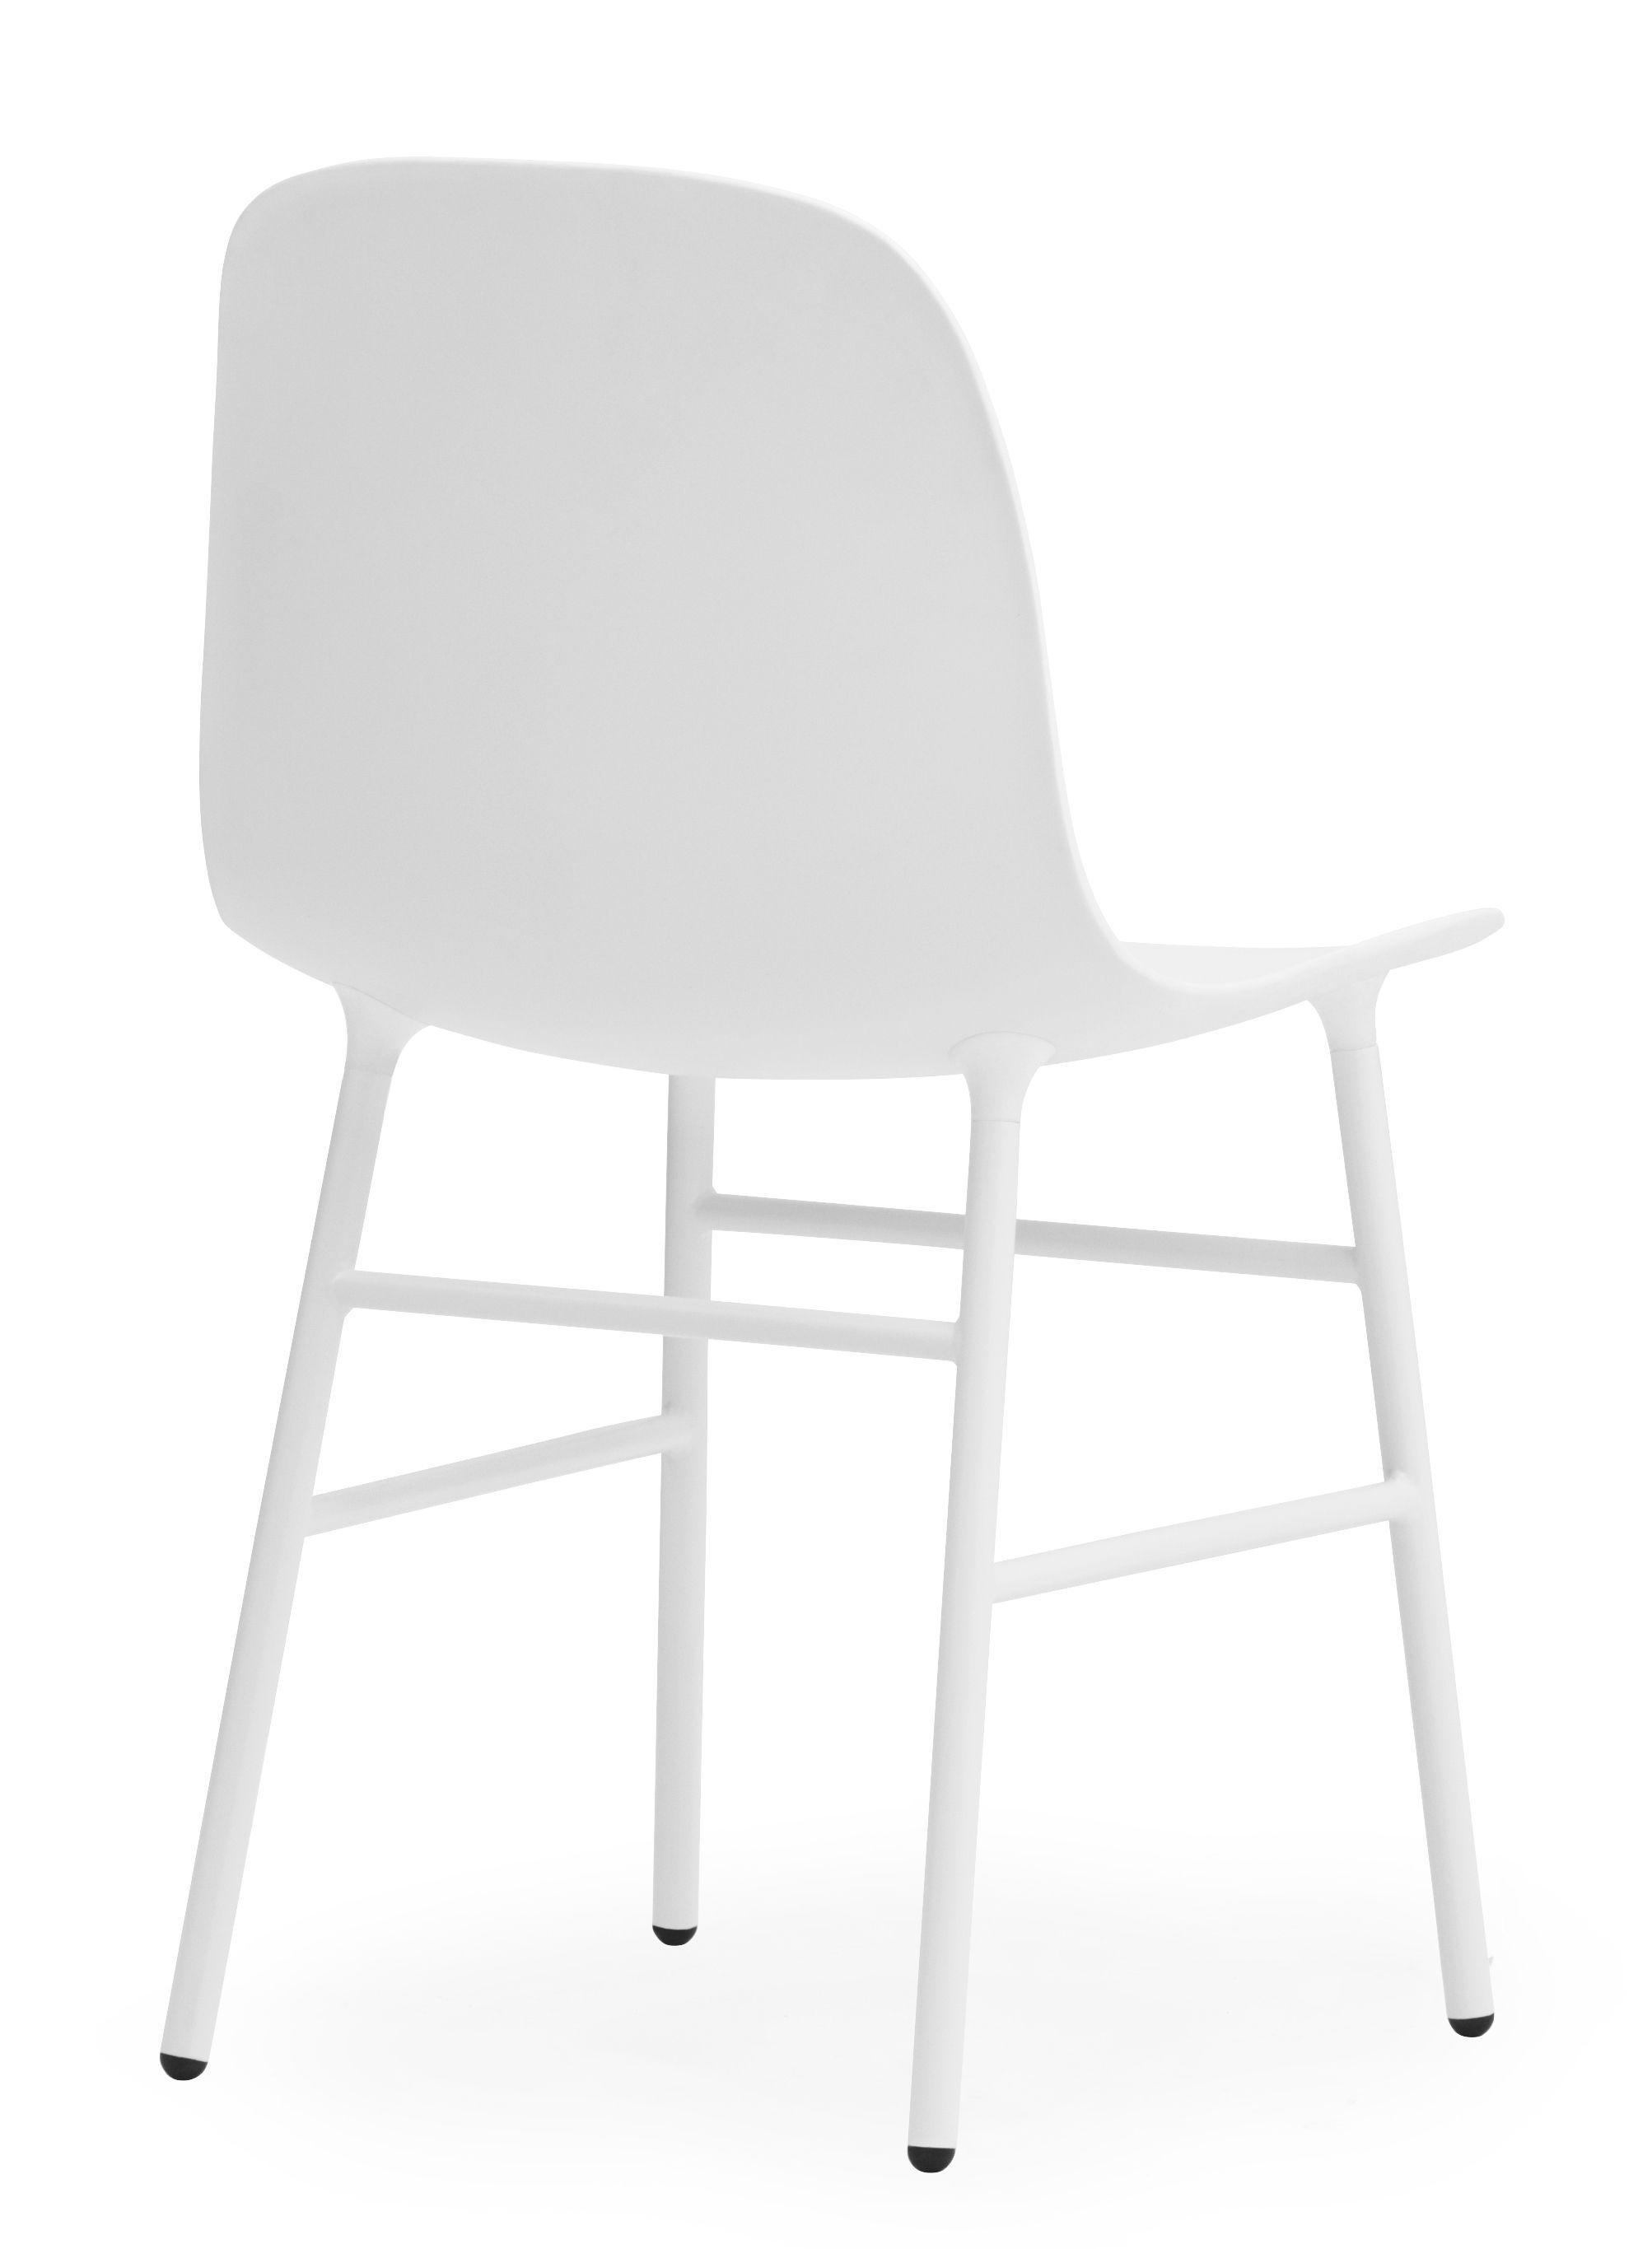 chaise form pied m tal blanc normann copenhagen. Black Bedroom Furniture Sets. Home Design Ideas